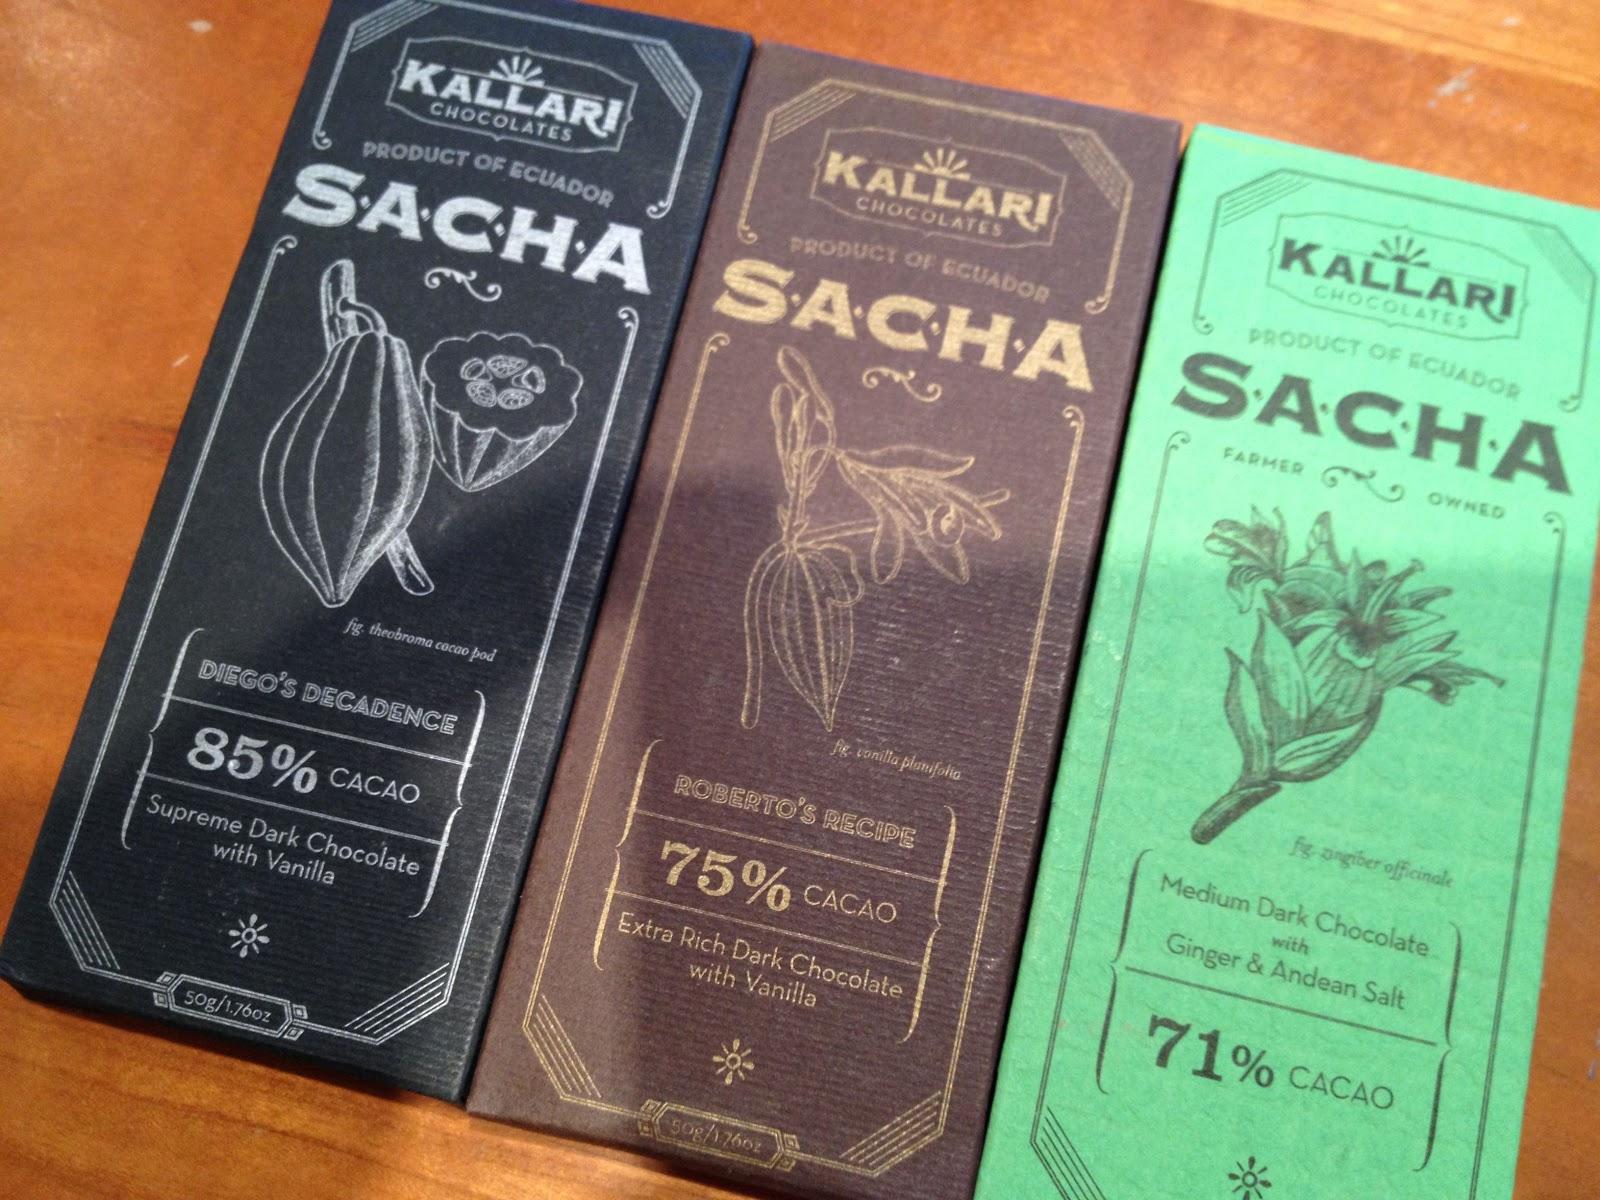 Finding Fine Chocolate: Kallari Sacha Bars and Cacao Farmer Felipe